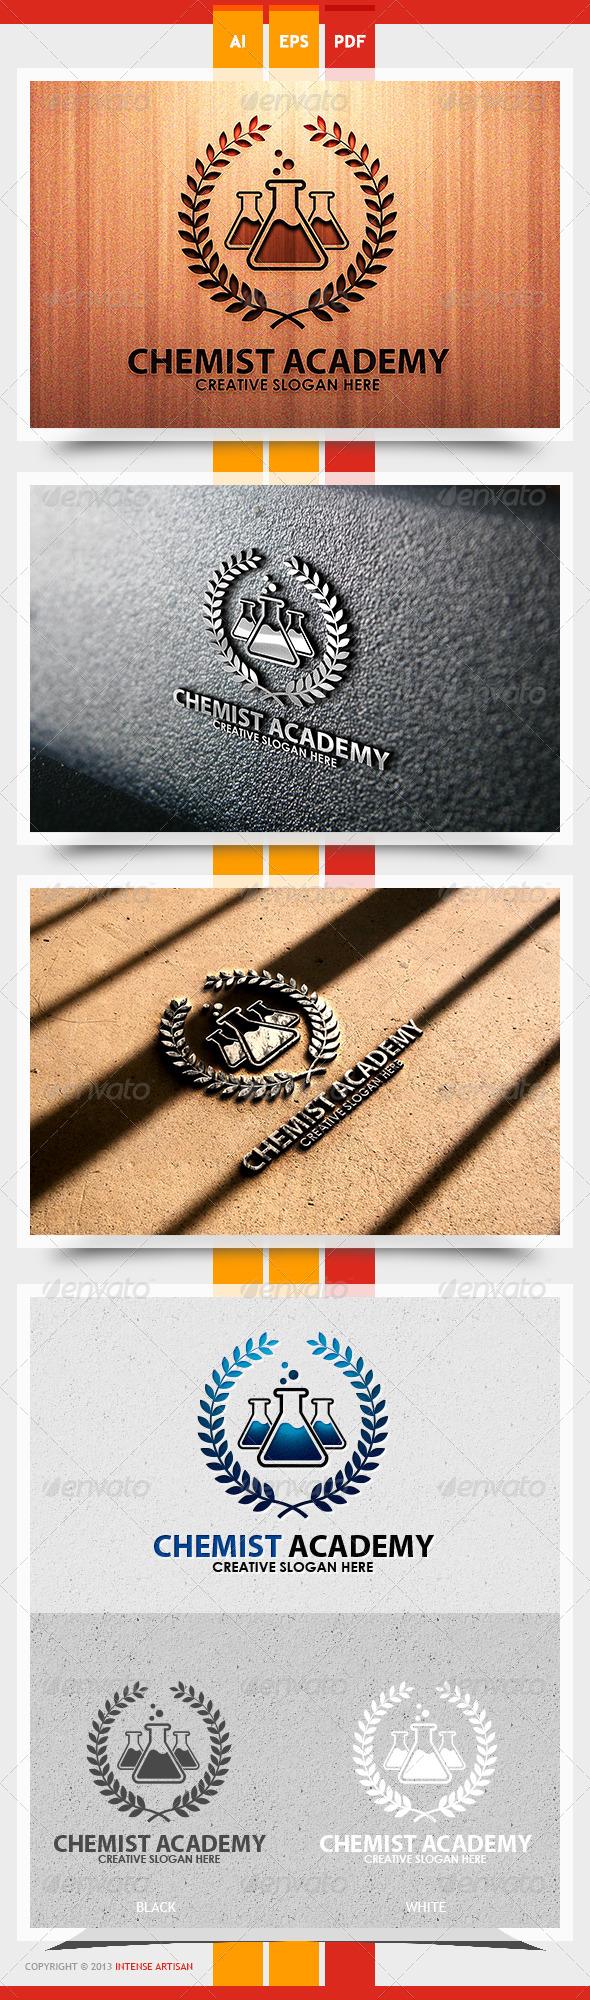 Chemist Academy Logo Template - Objects Logo Templates